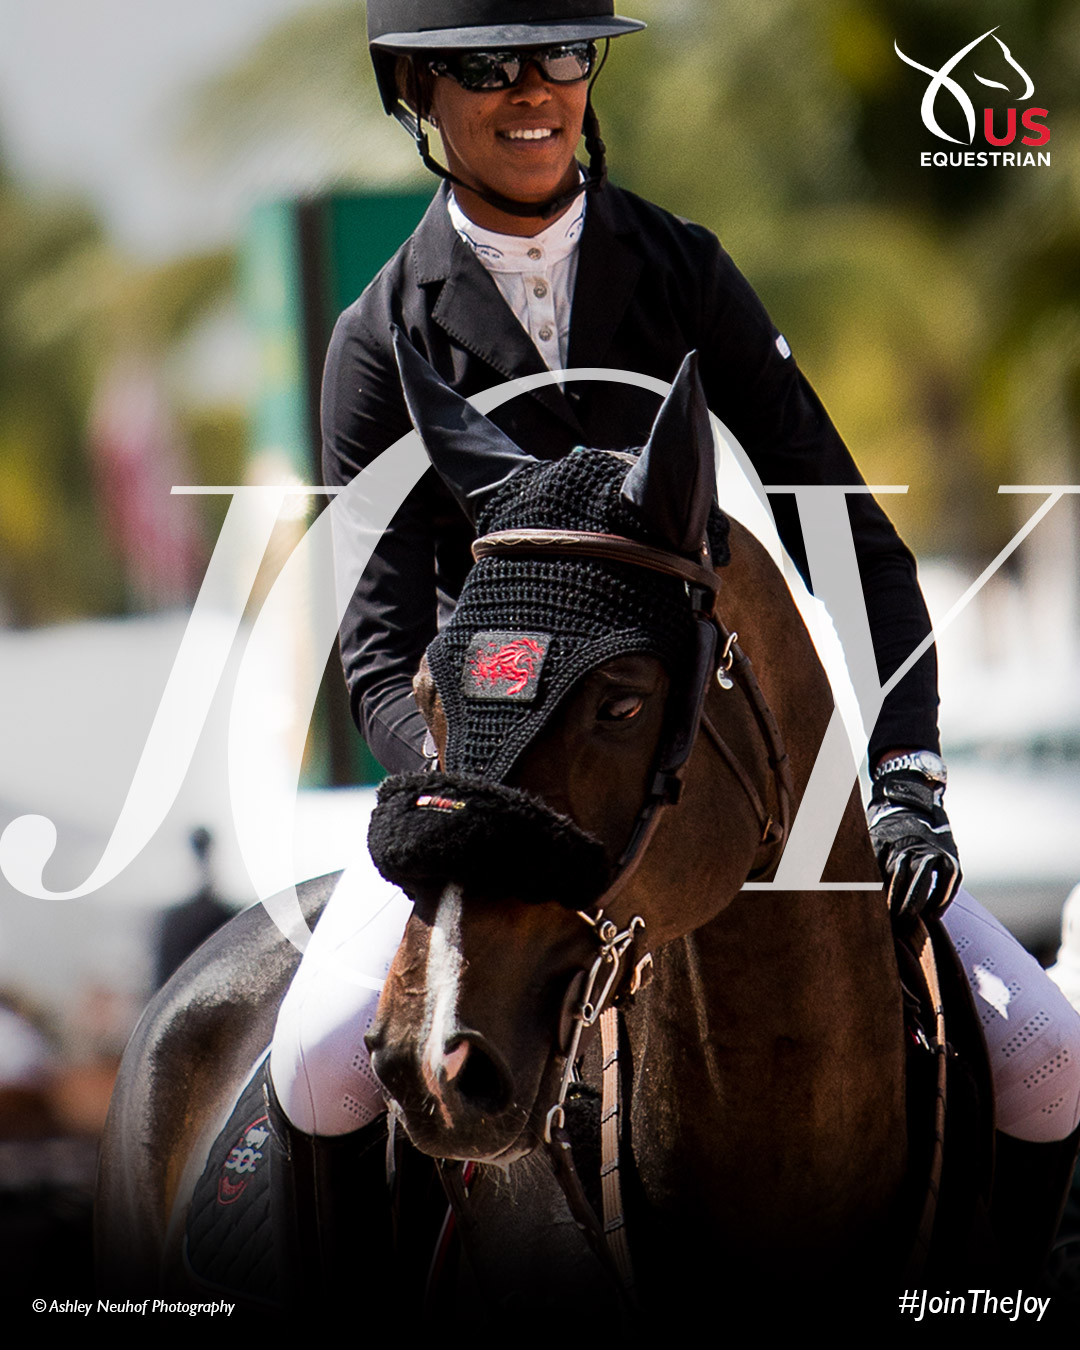 US equestrian ad featuring Mavis Spencer